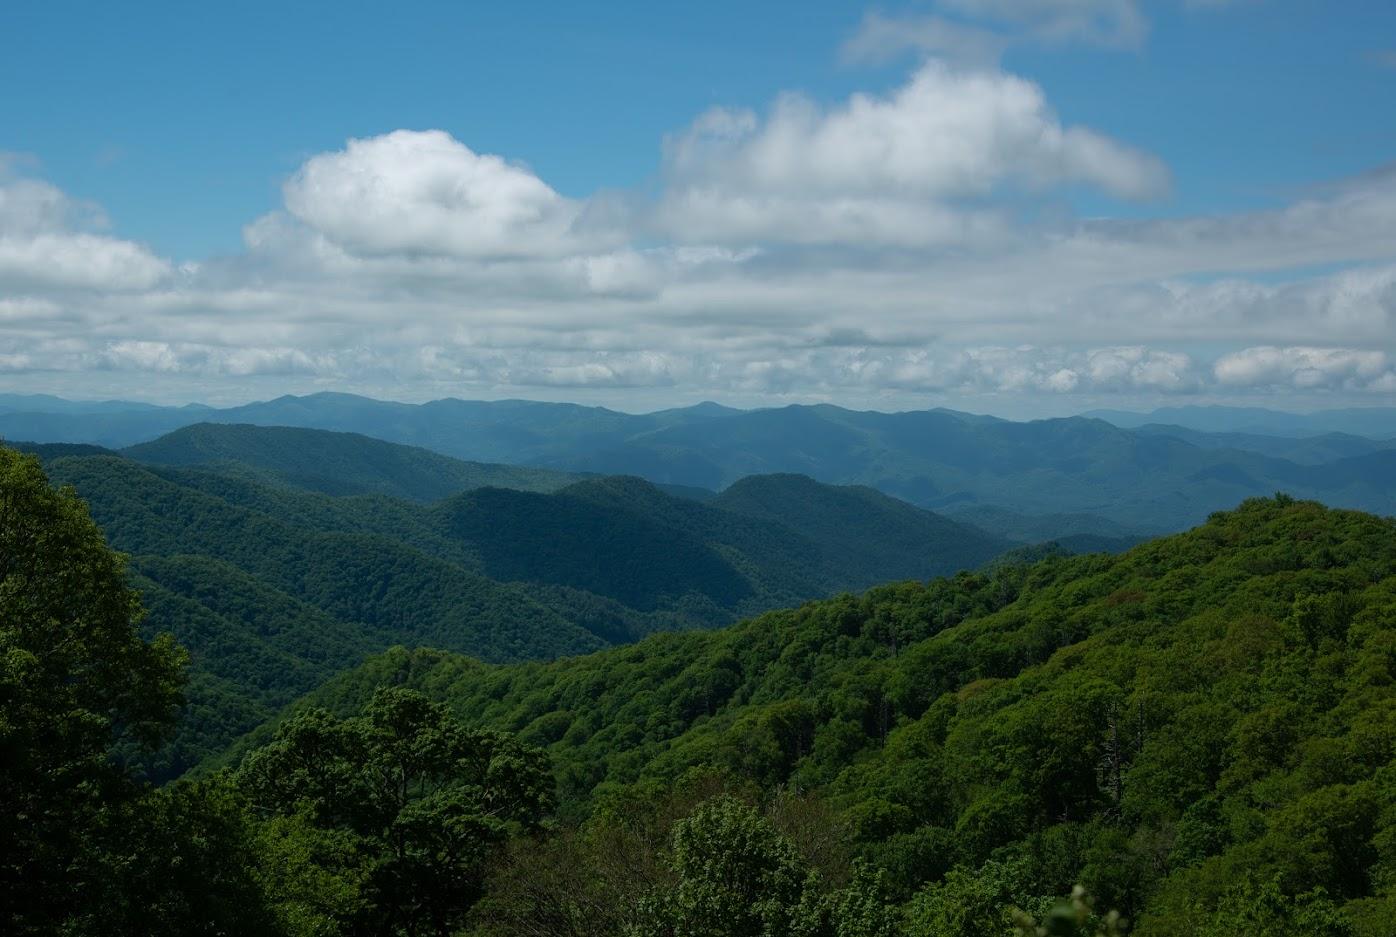 Поездка с Запада на Американский Юго-Восток: NM -> TX -> OK -> AR -> TN (Great Smoky Mountains) -> NC -> GA